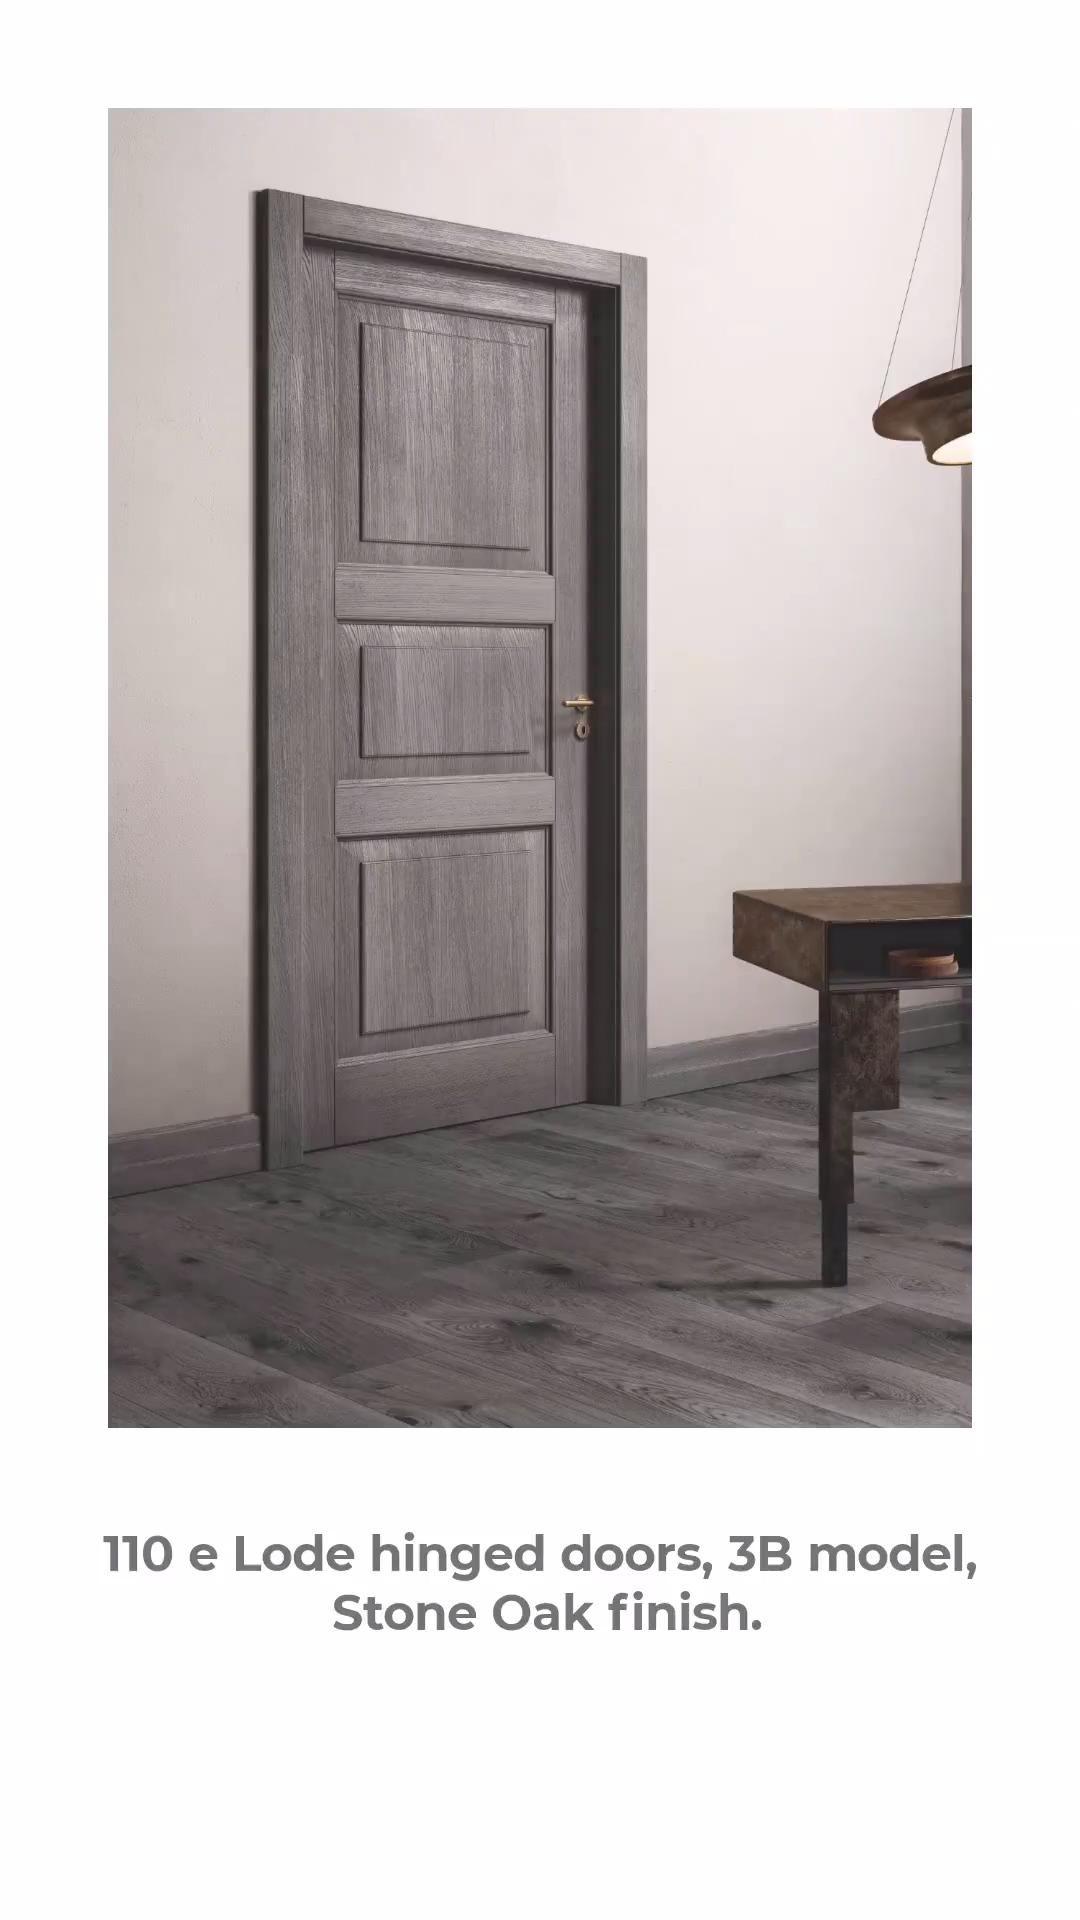 110 e Lode hinged doors, 3B model, Stone Oak finish